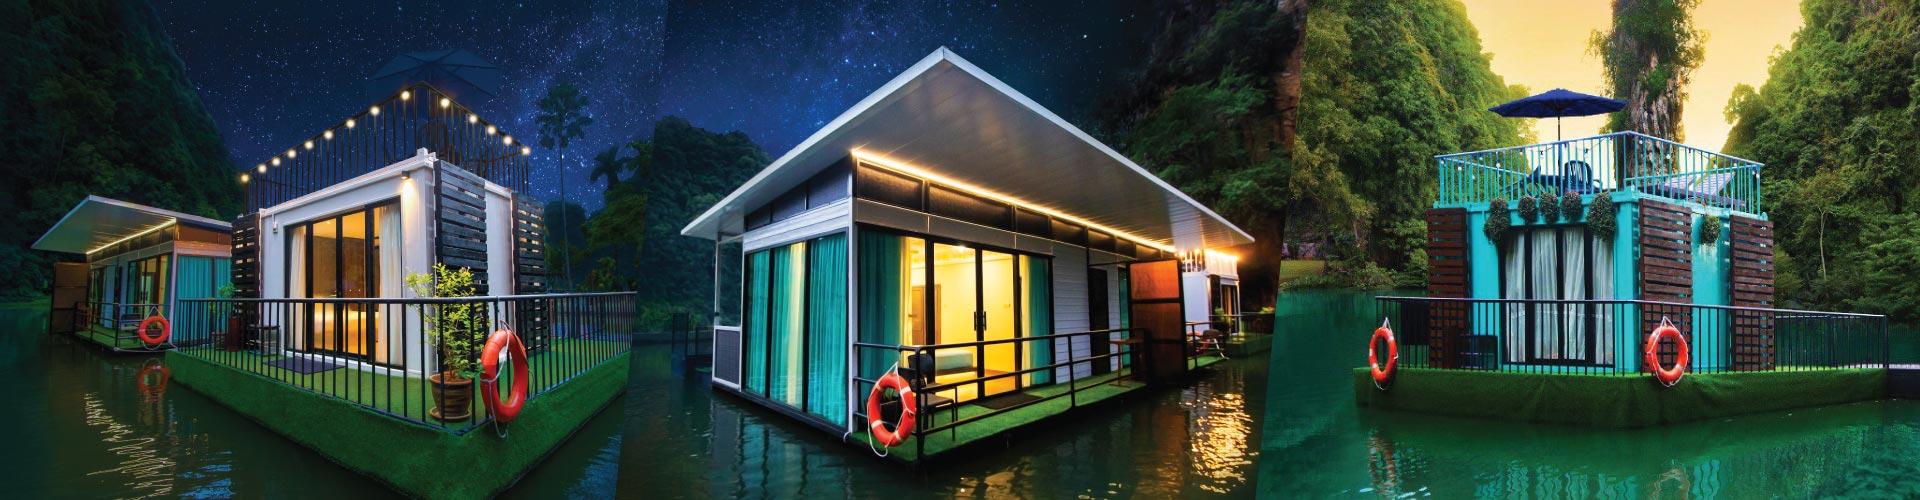 Lost World Of Tambun @ Floating Villa